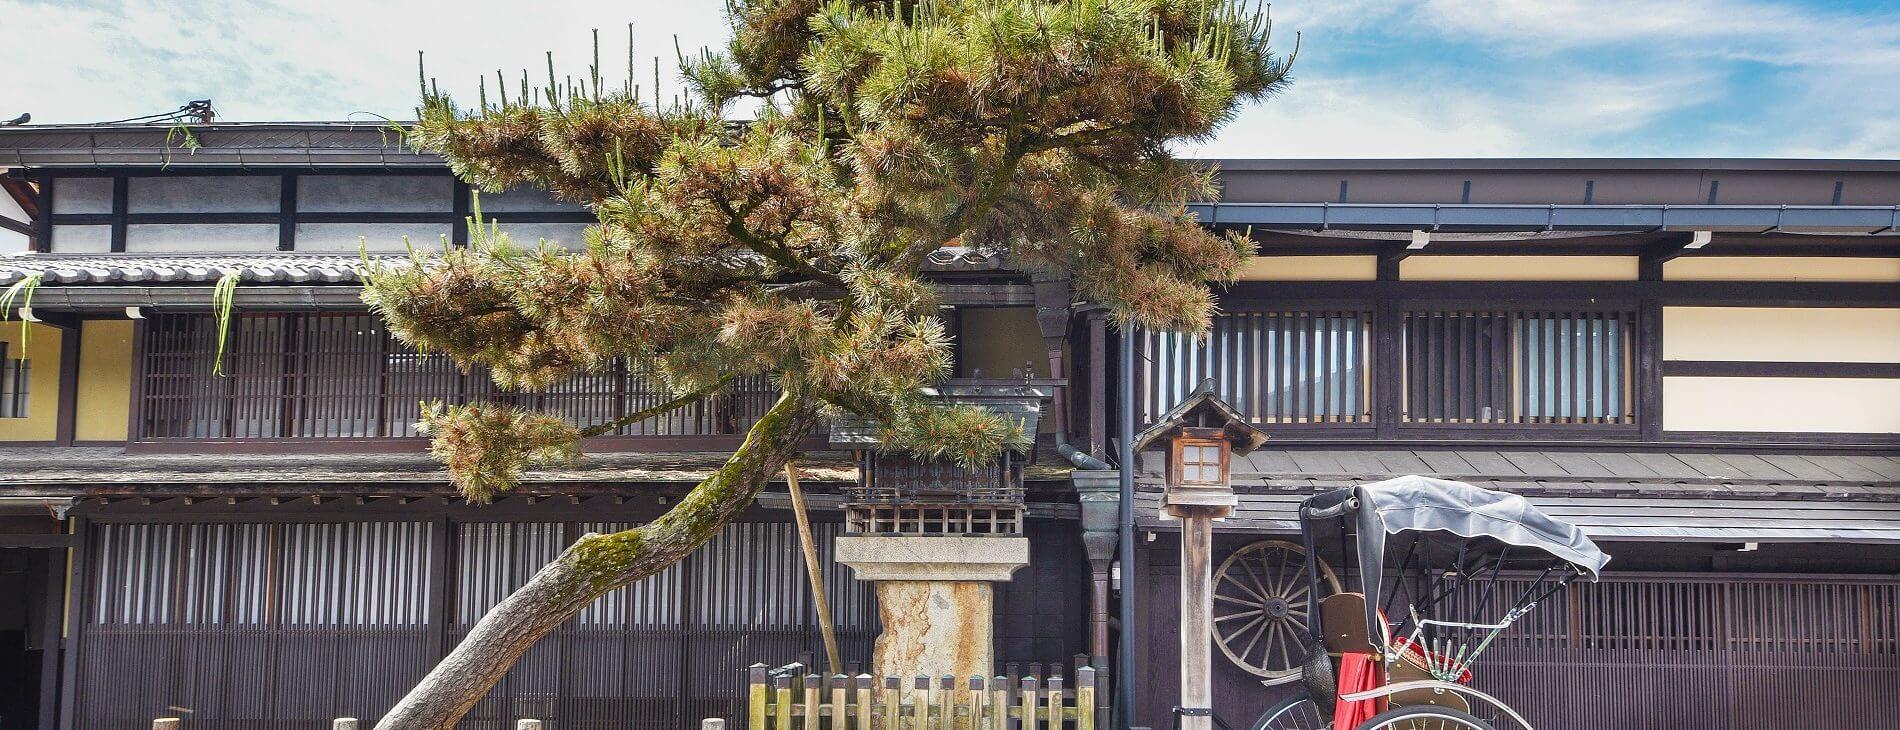 mastroviaggiatore-takayama-Old street in historical city Takayama in Japan copertina